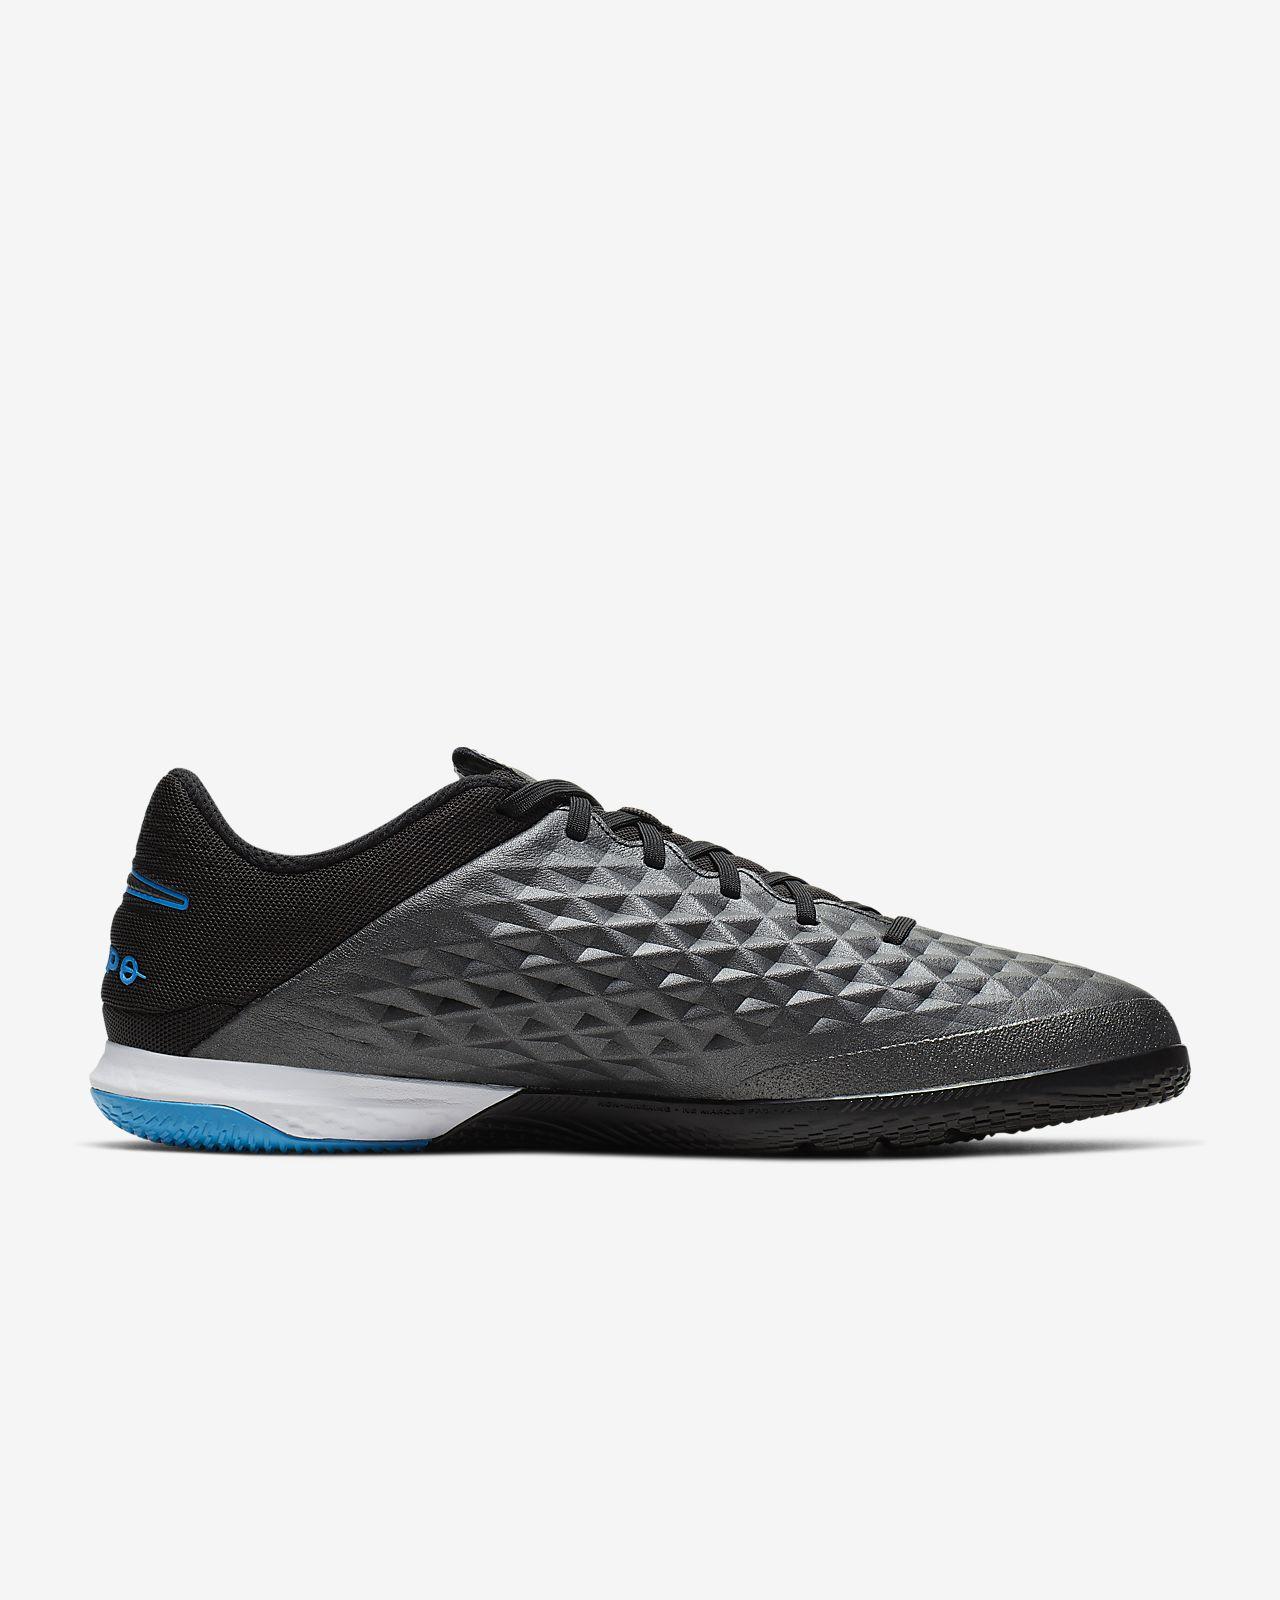 11 Adidas Schuhe Good Us Eur Year 20 00Picclick De 10 Uk 5